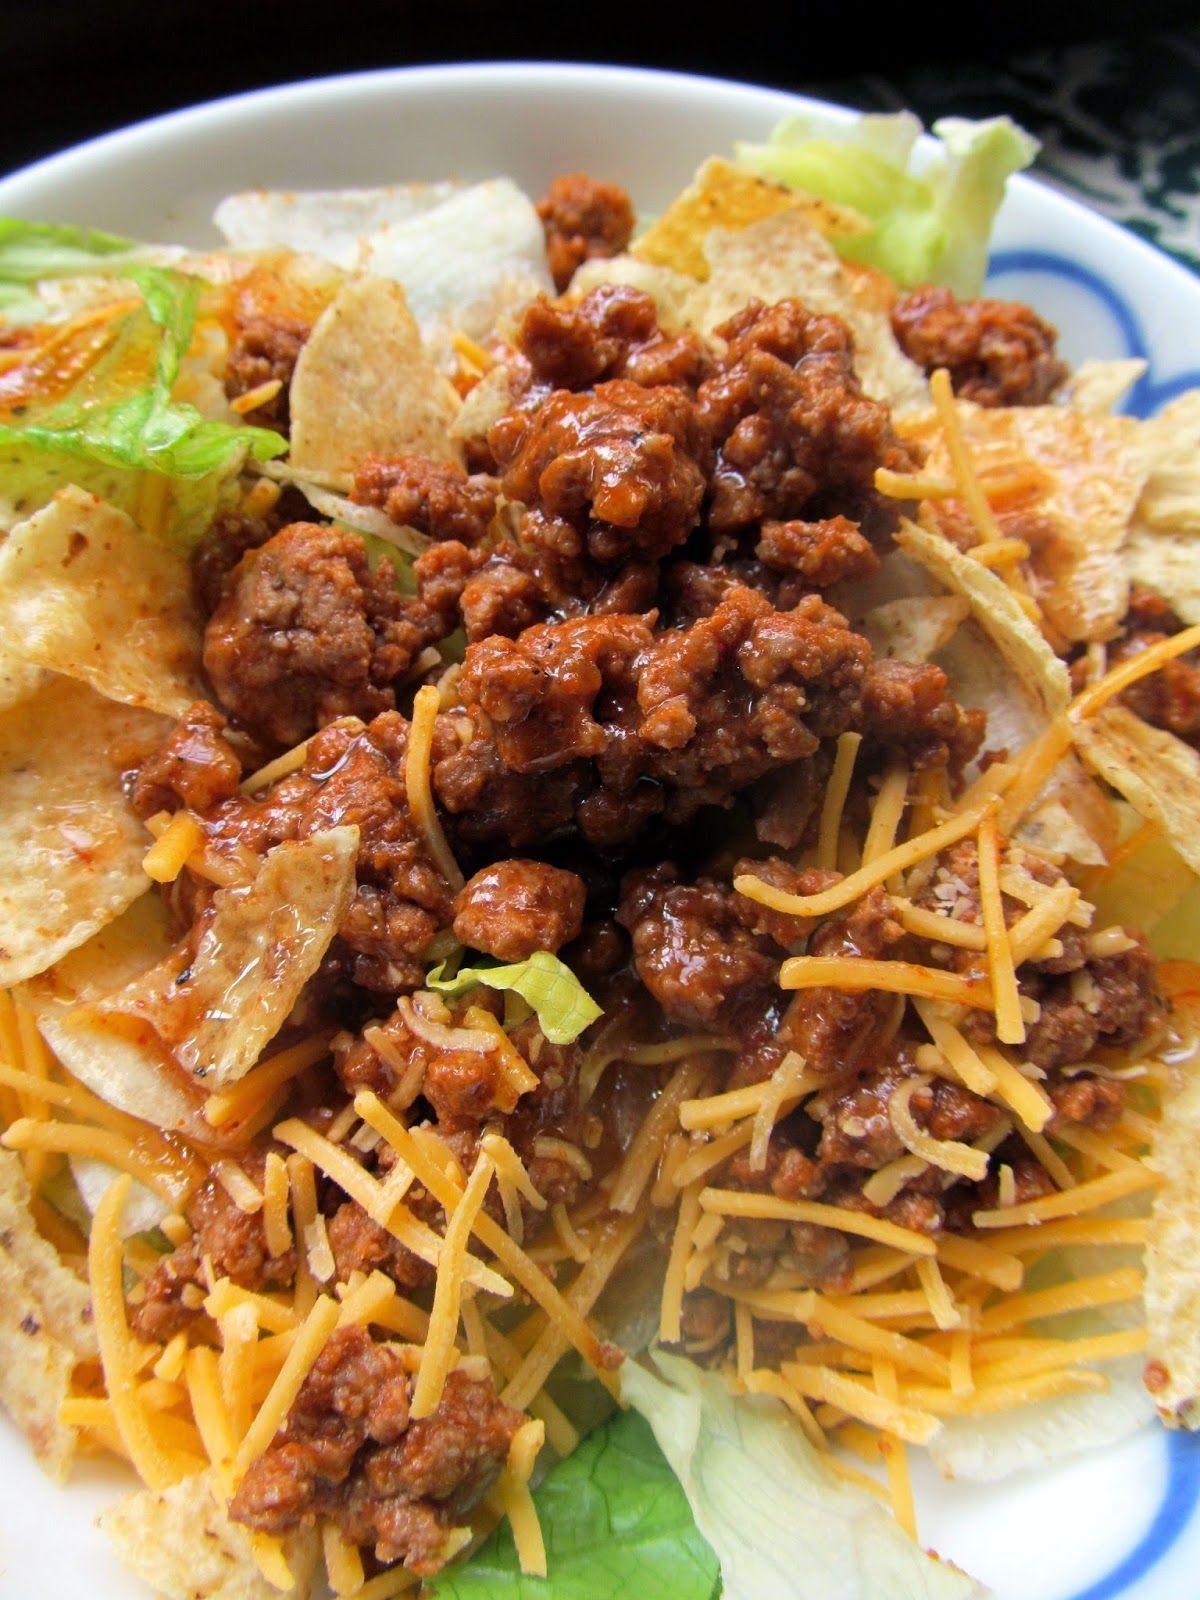 Home on the Range: DIY Taco Seasoning #diytacoseasoning Home on the Range: DIY Taco Seasoning #tacoseasoningpacket